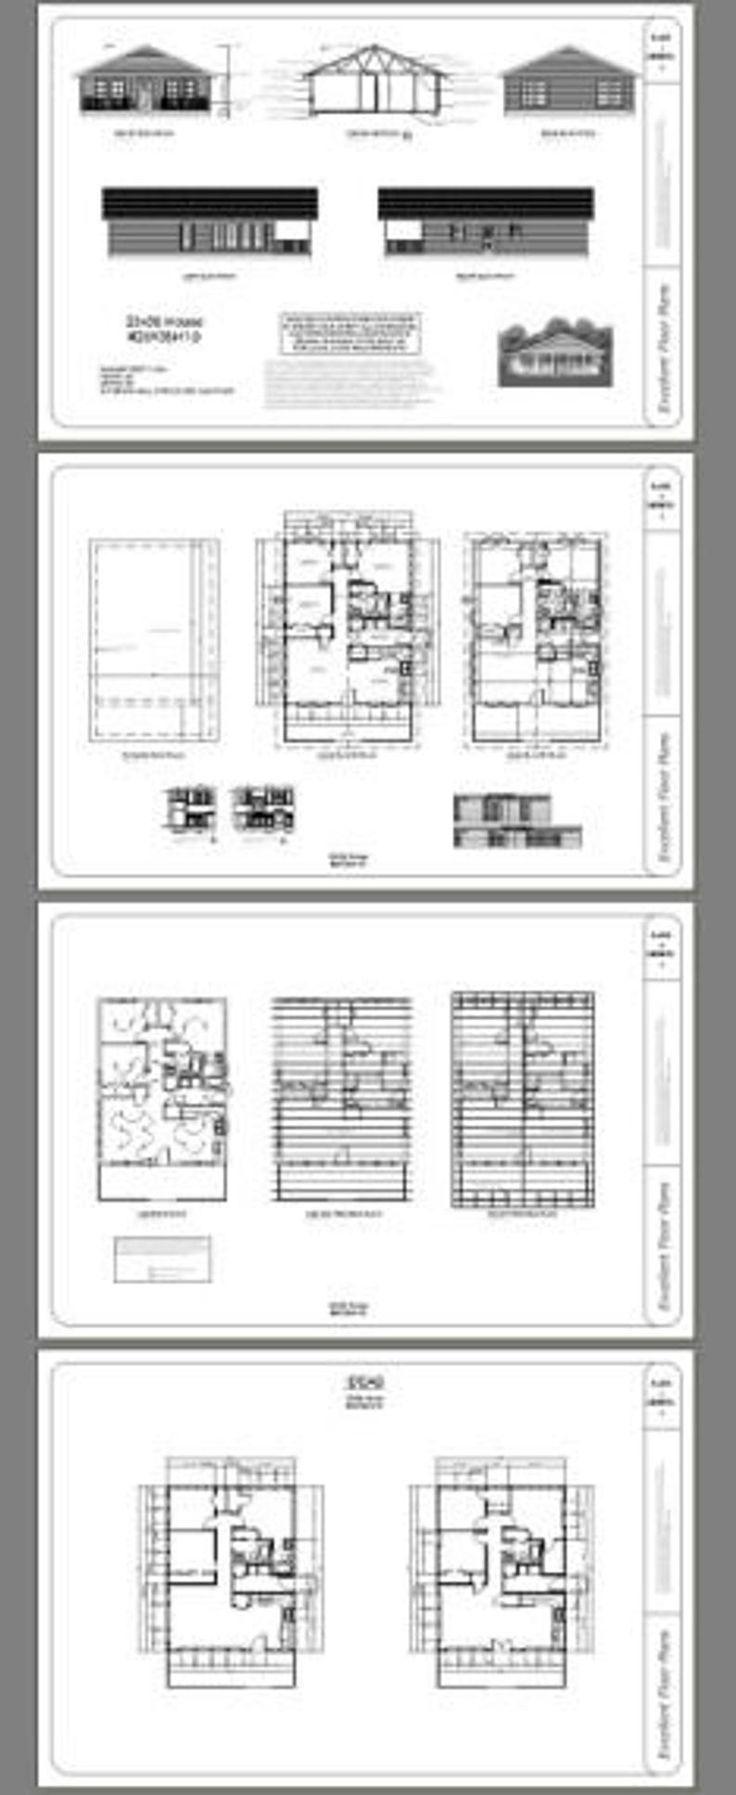 28x36 House 3Bedroom 2Bath 1,008 sq ft PDF